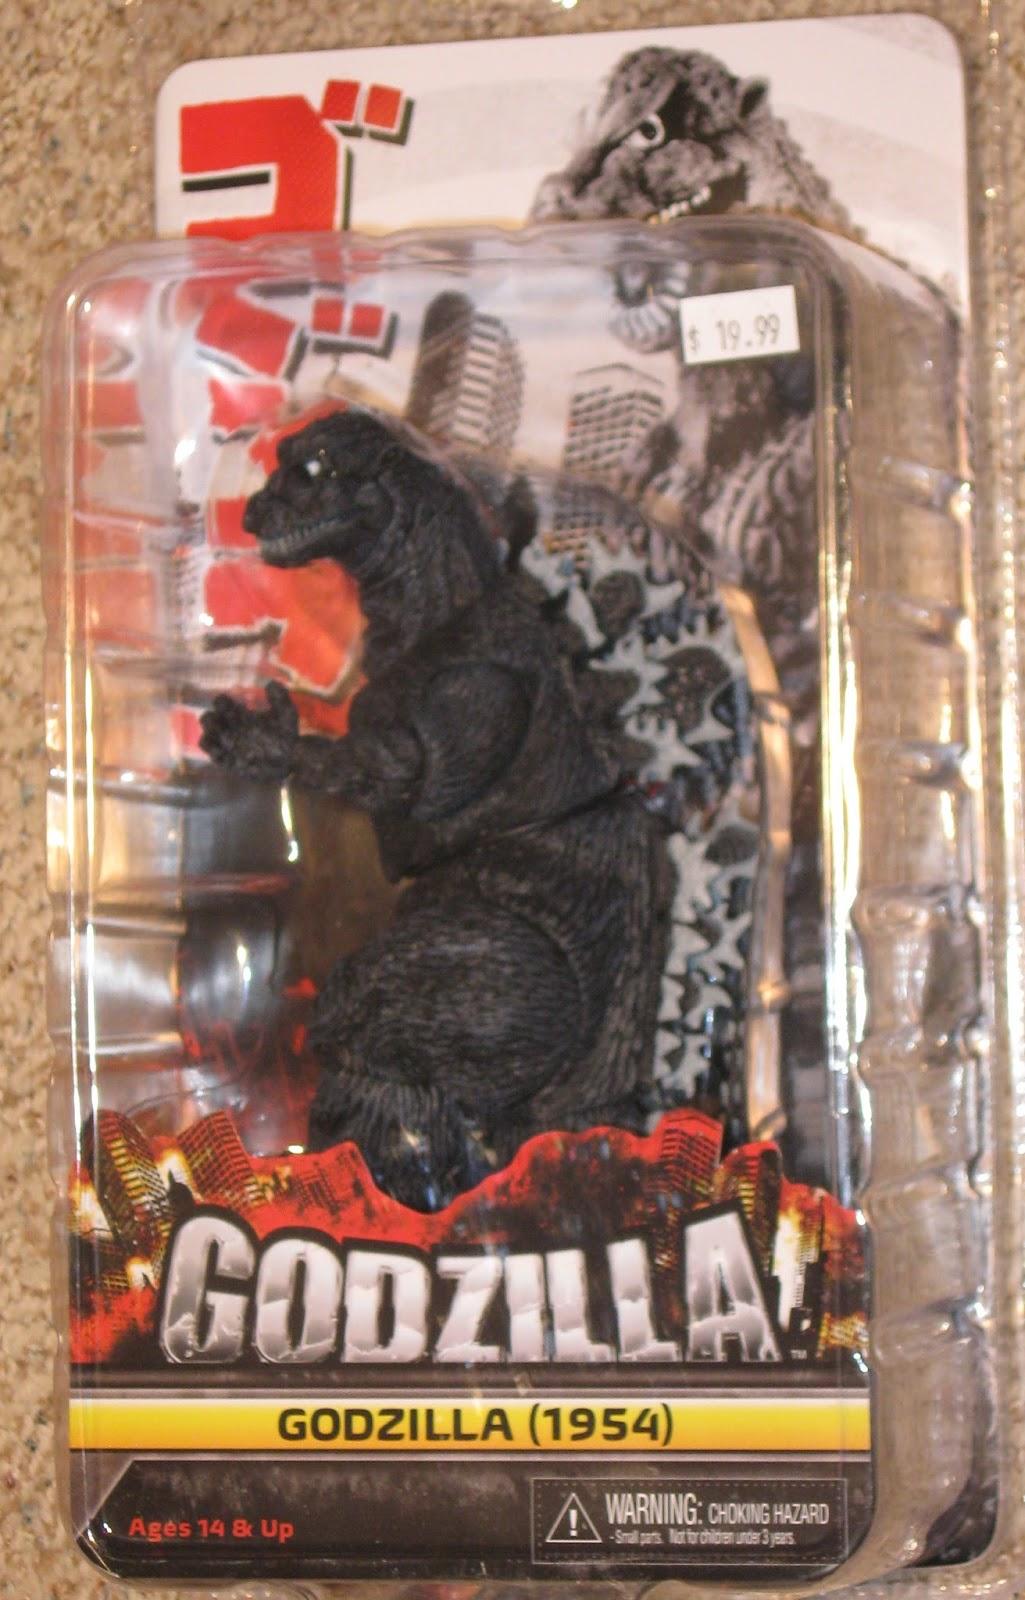 The Toyseum Godzilla 1954 Neca Godzilla Figure Review